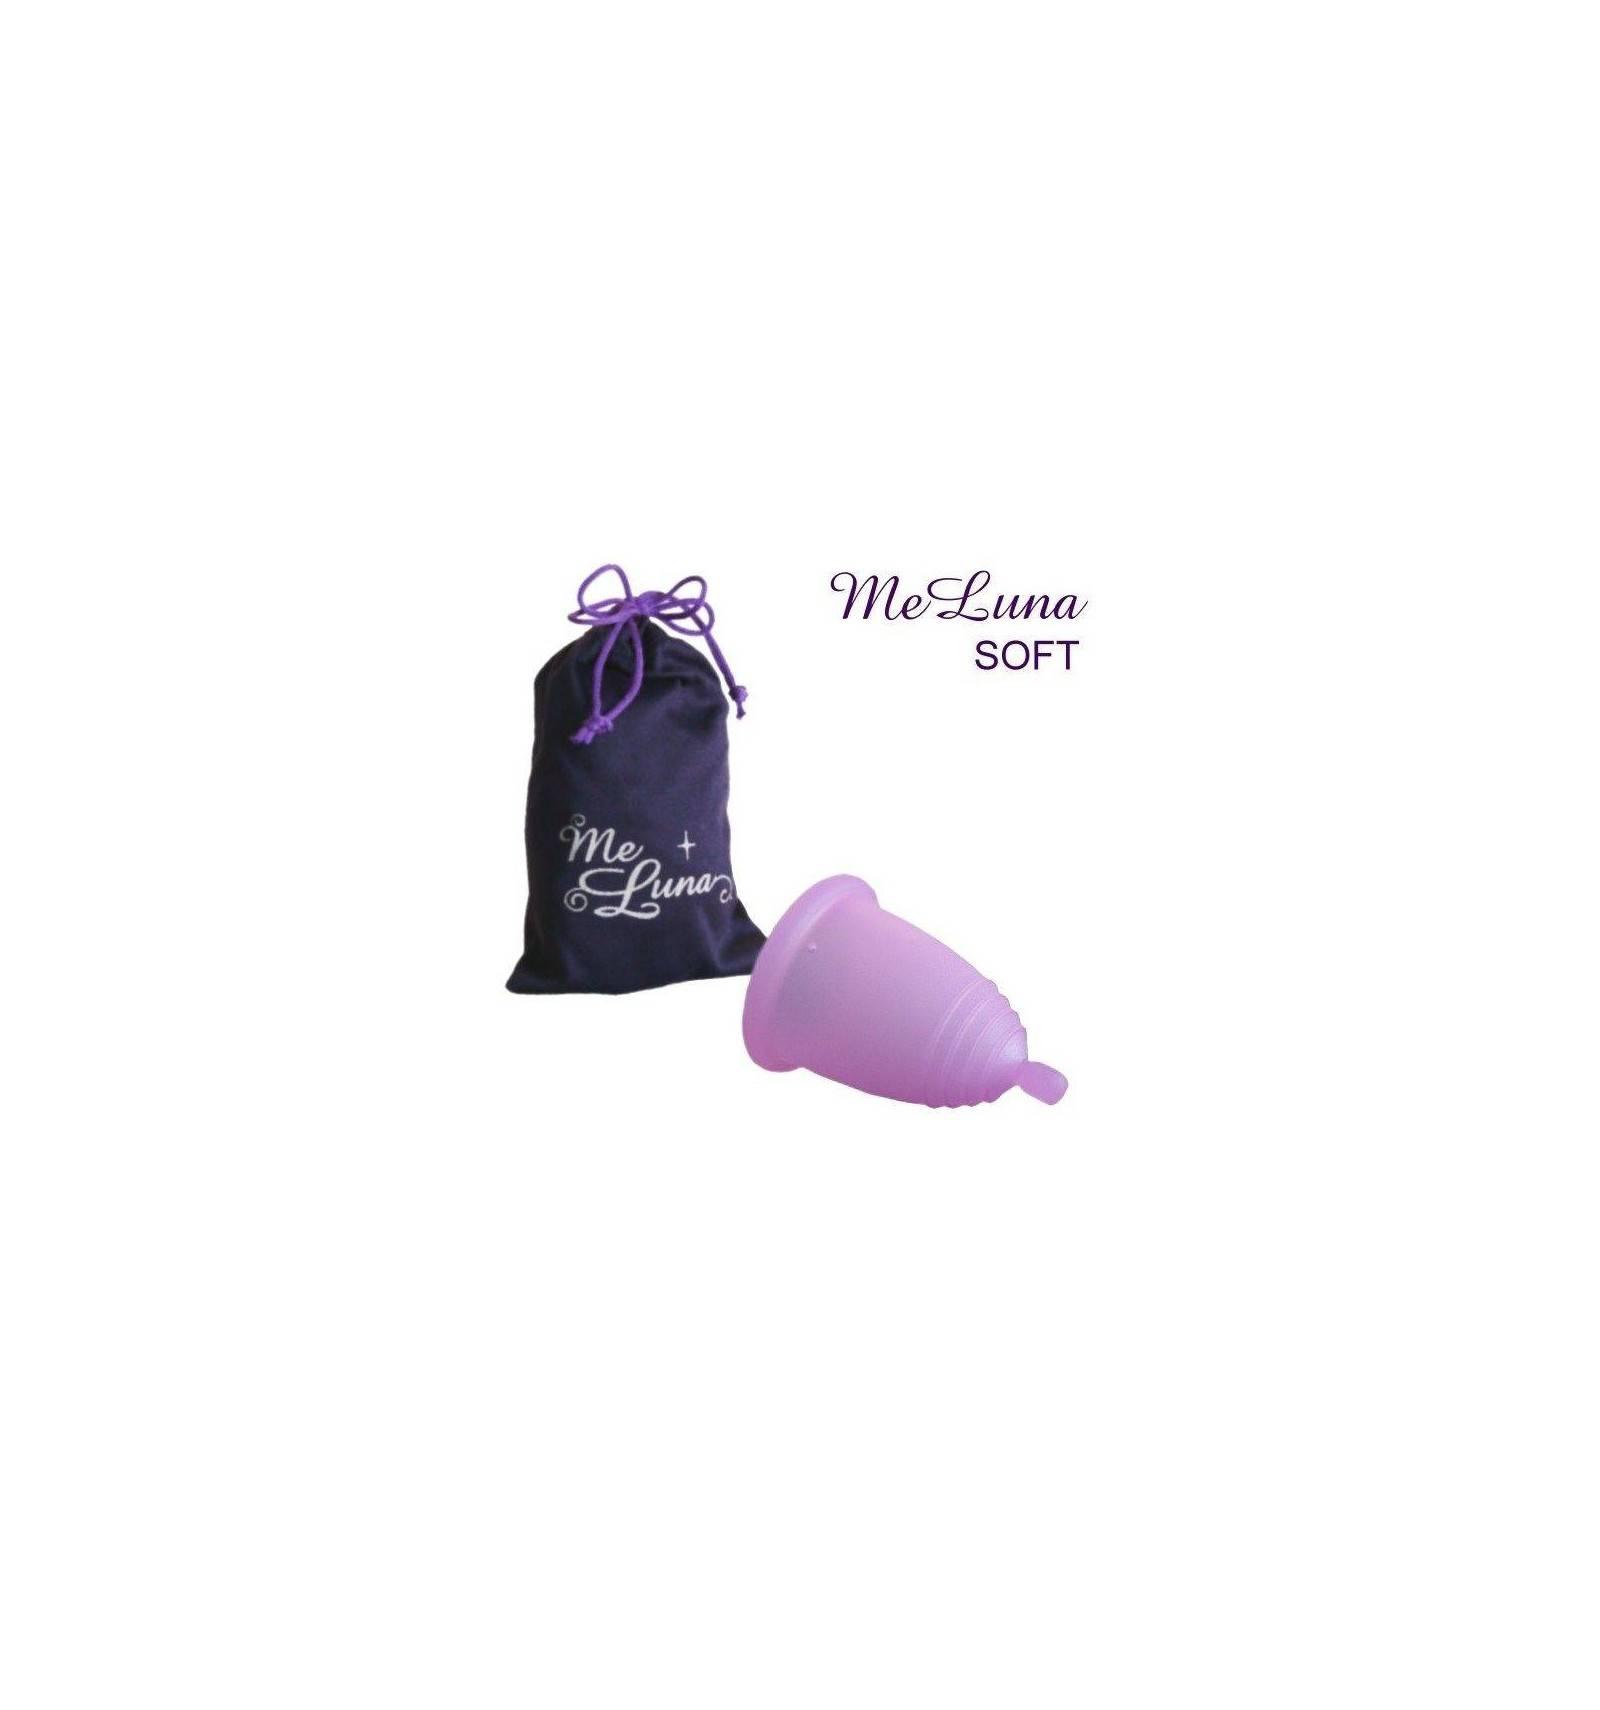 Copa Menstrual MeLuna Soft, Bola